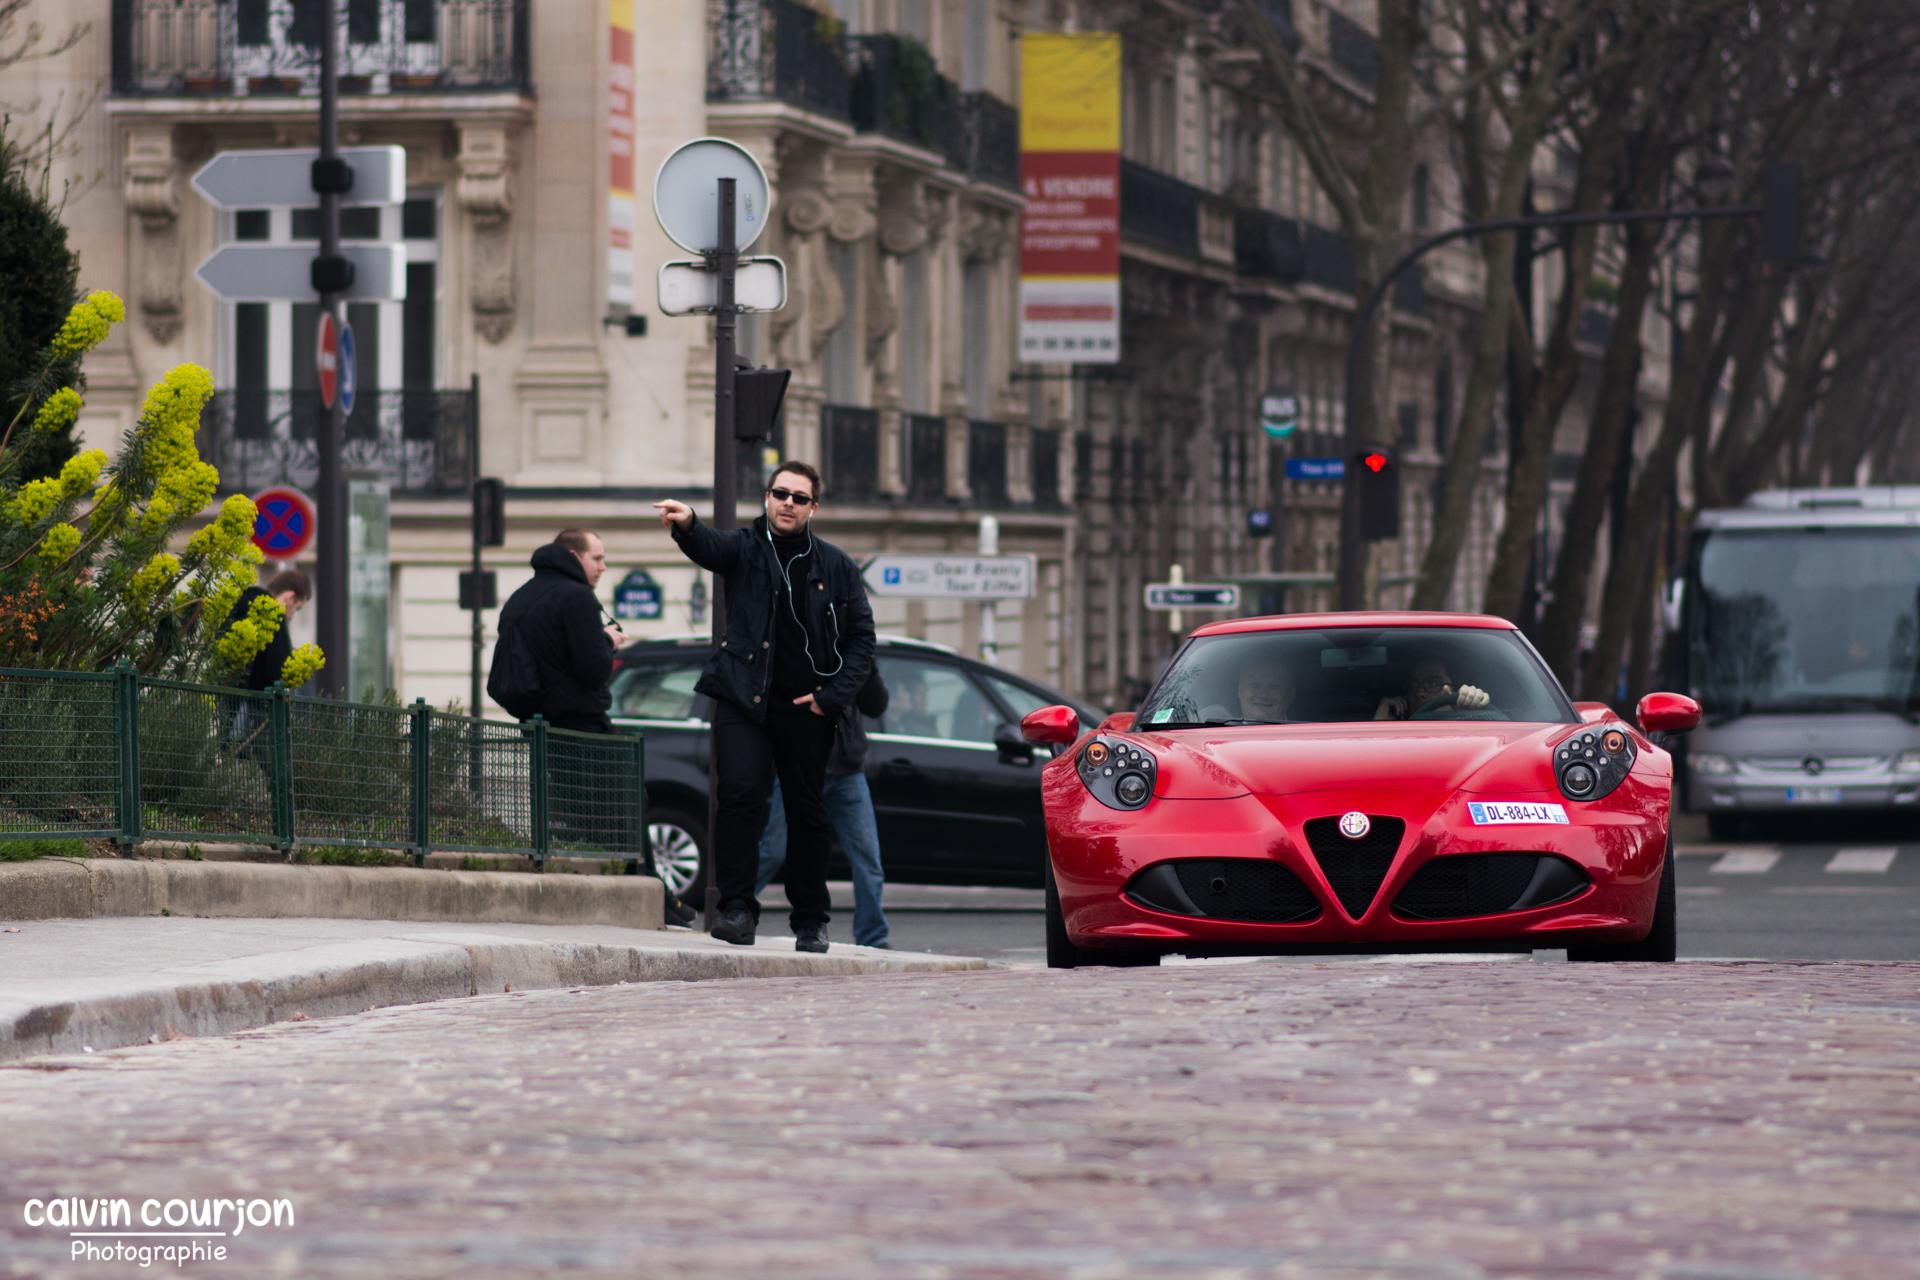 Alfa Romeo 4C - Rallye Paris 2015 - Calvin Courjon Photographie